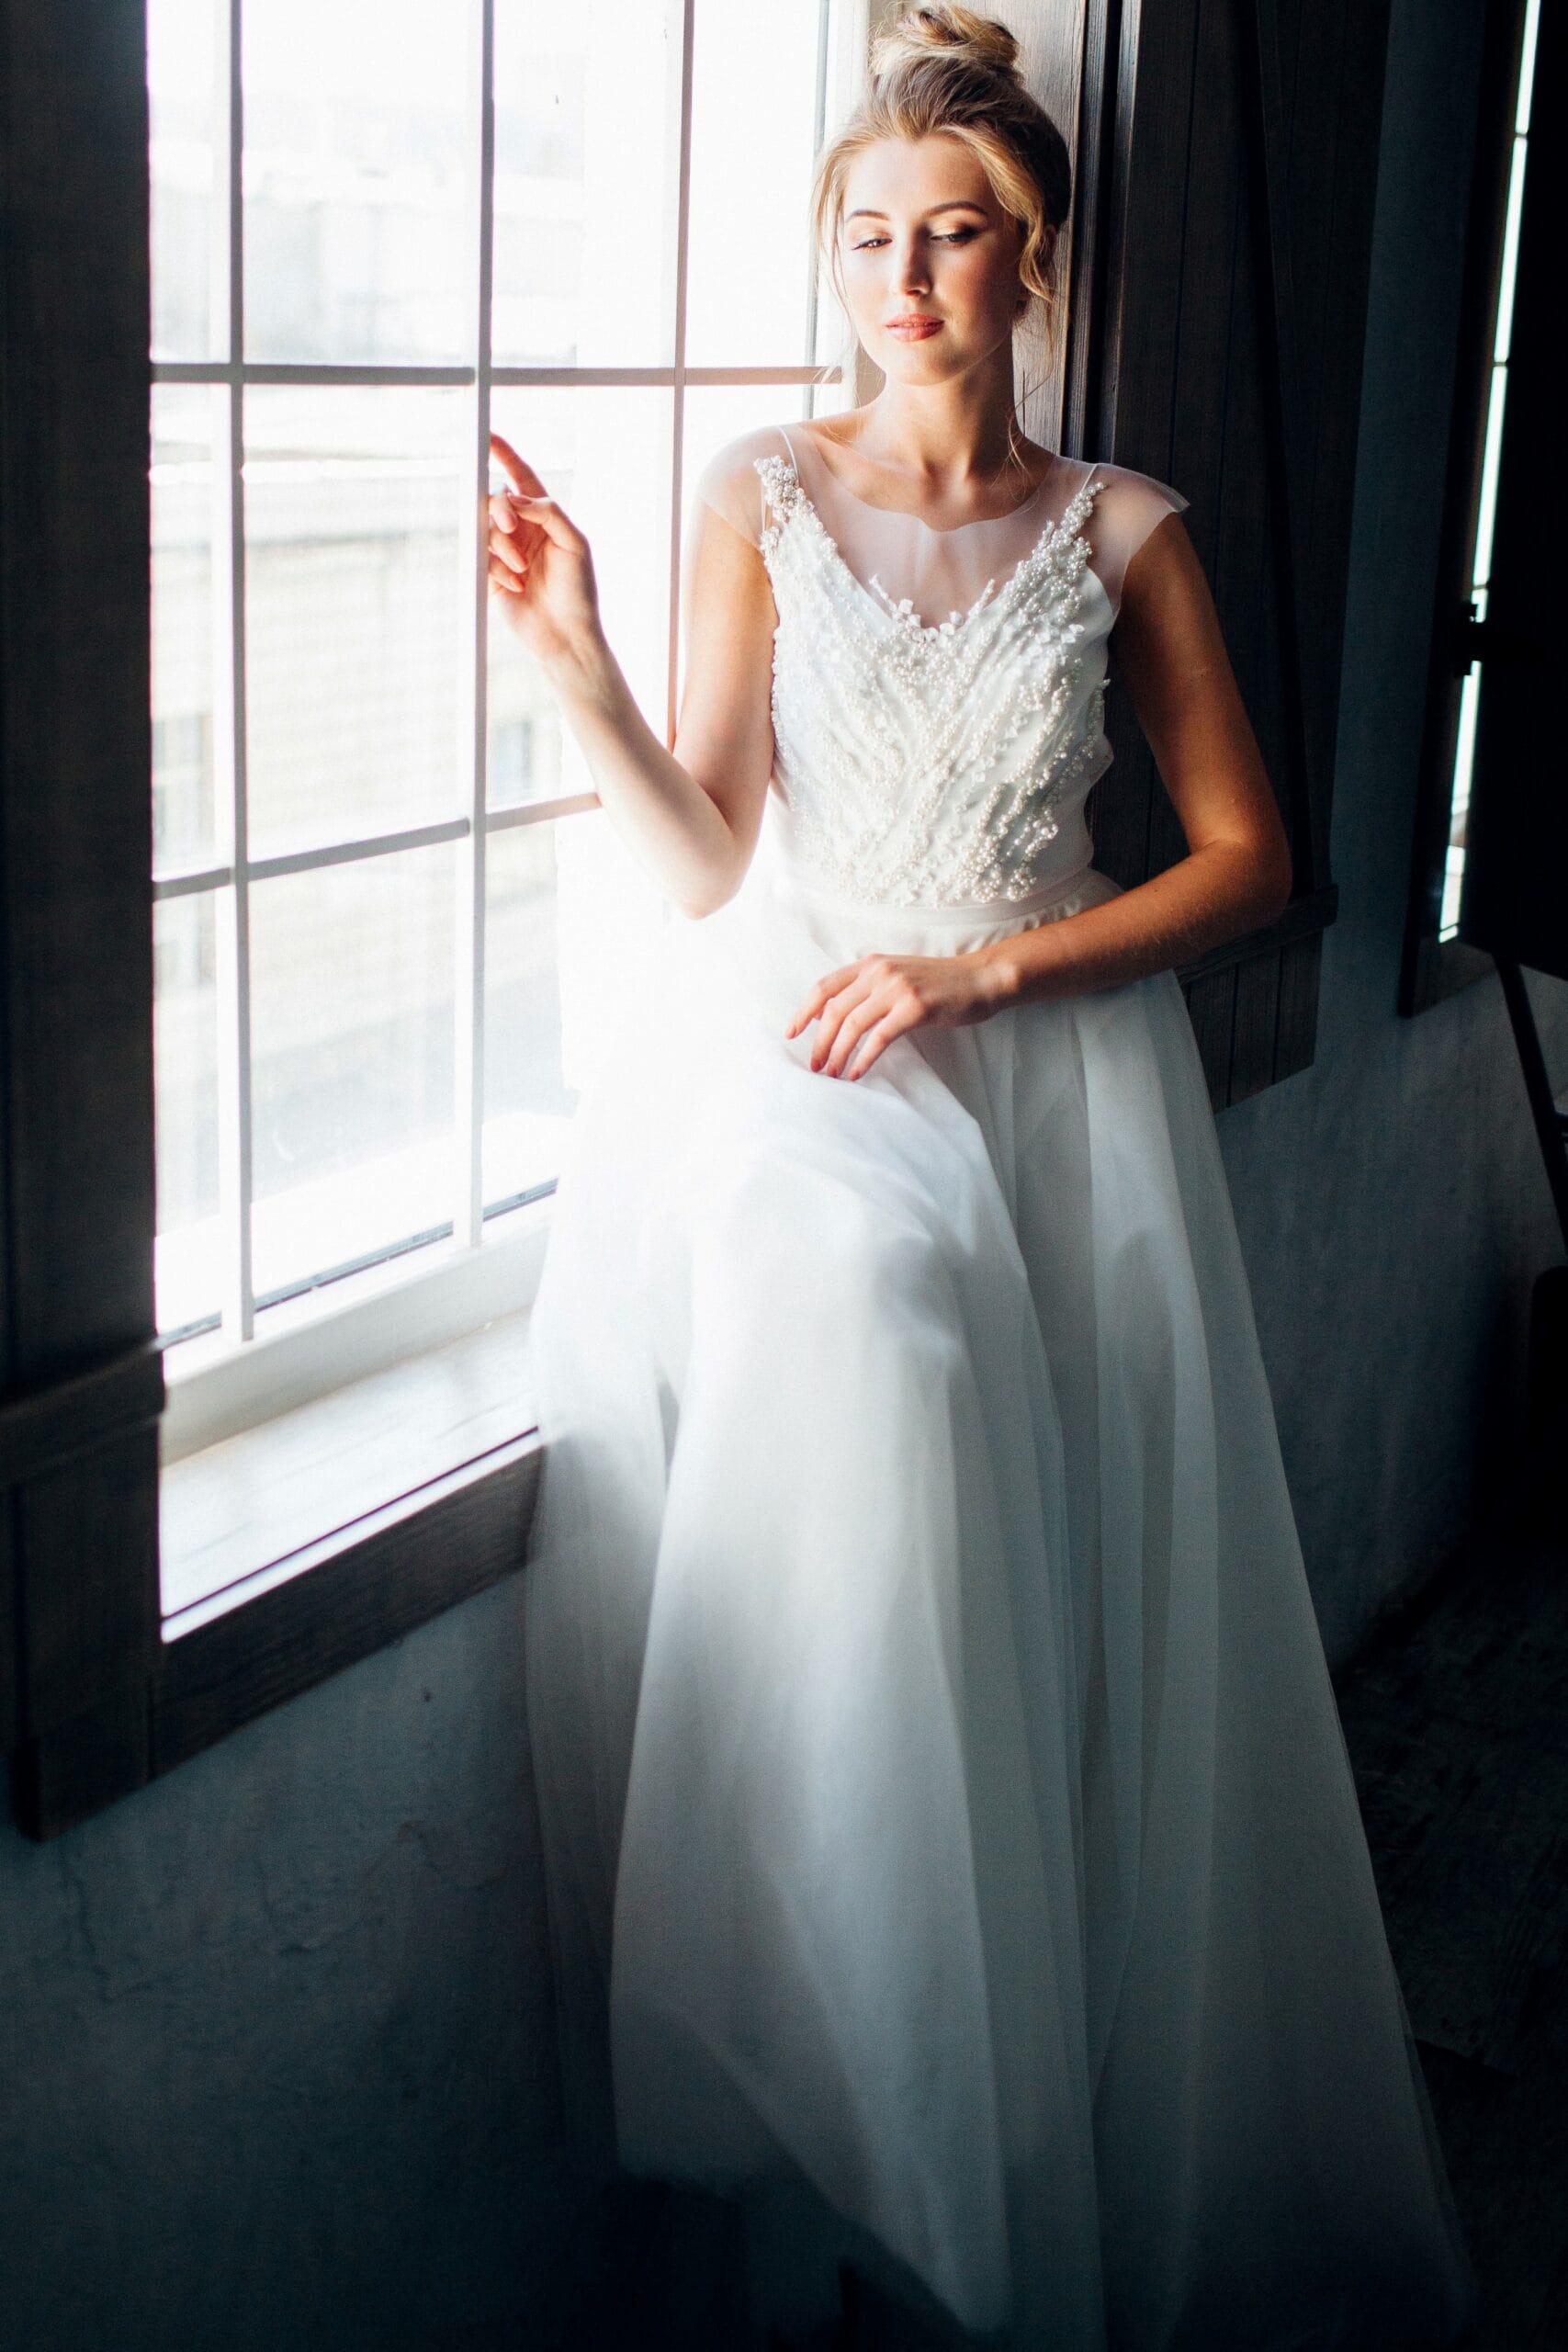 Свадебное платье MURIELA, коллекция THE ANGELS, бренд RARE BRIDAL, фото 4